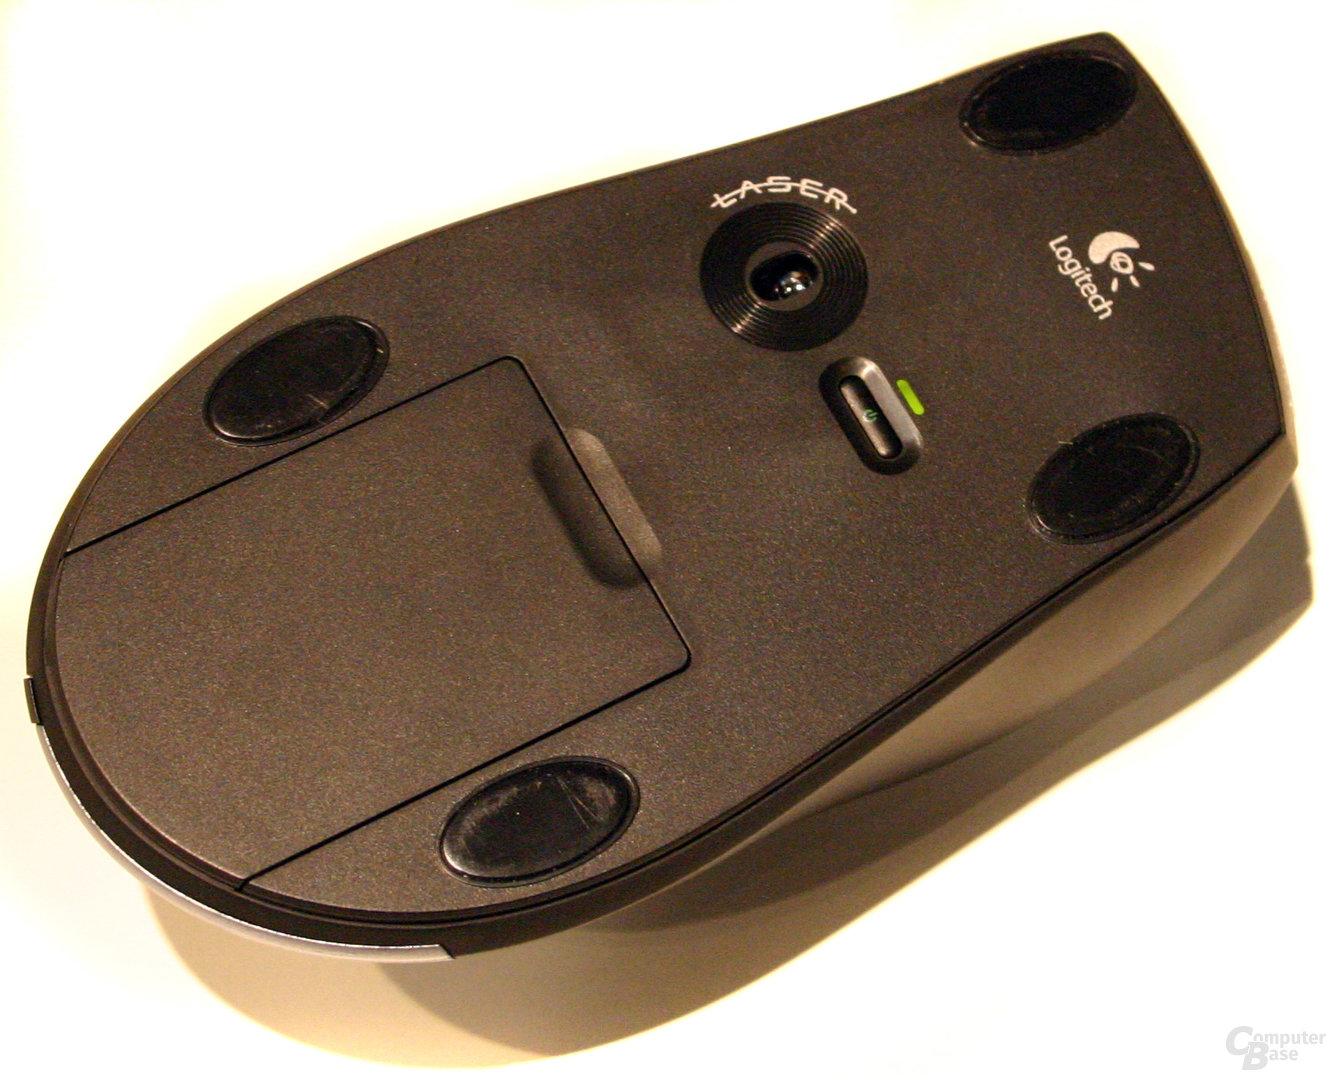 Logitech MX610 Left